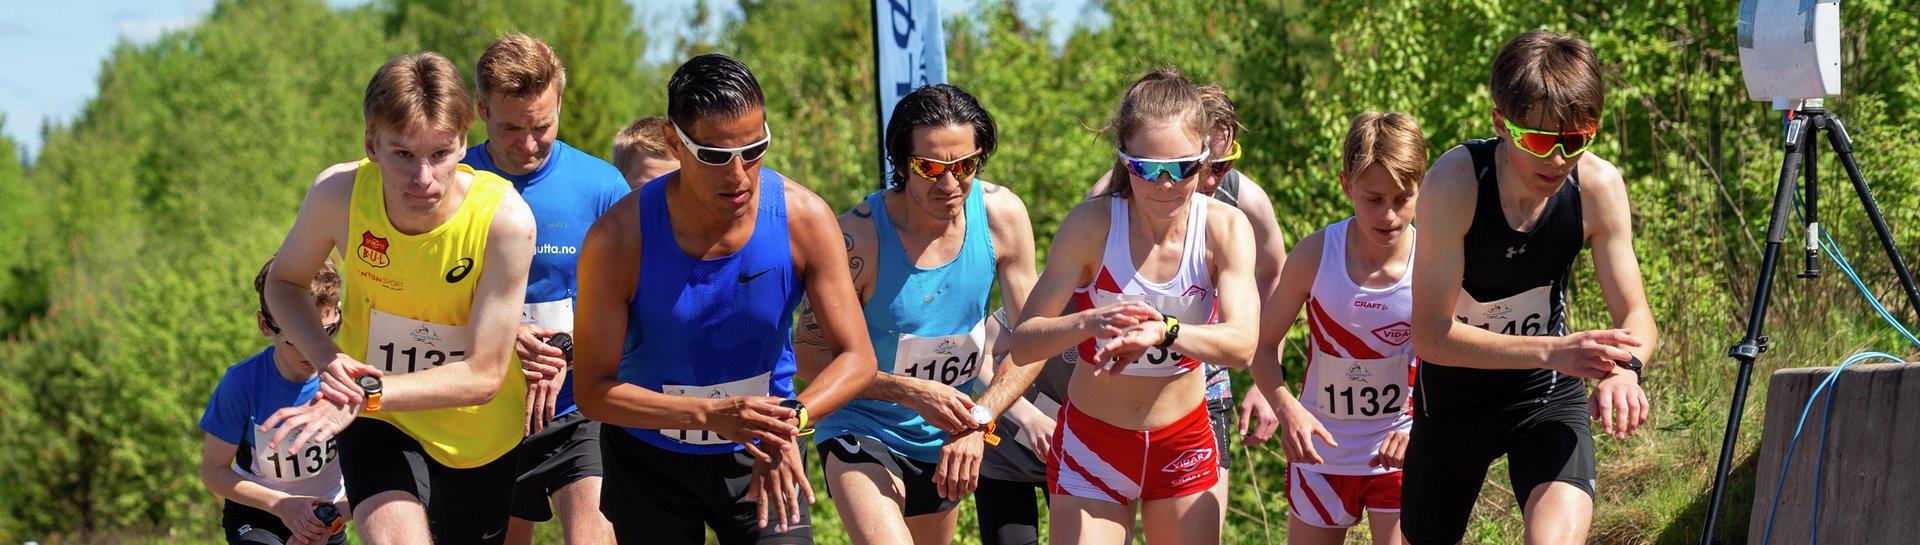 Perseløpet 5km - Jørgen Russnes, Emilie Mo, Fredrik Halsbog, Rodrigo Belda